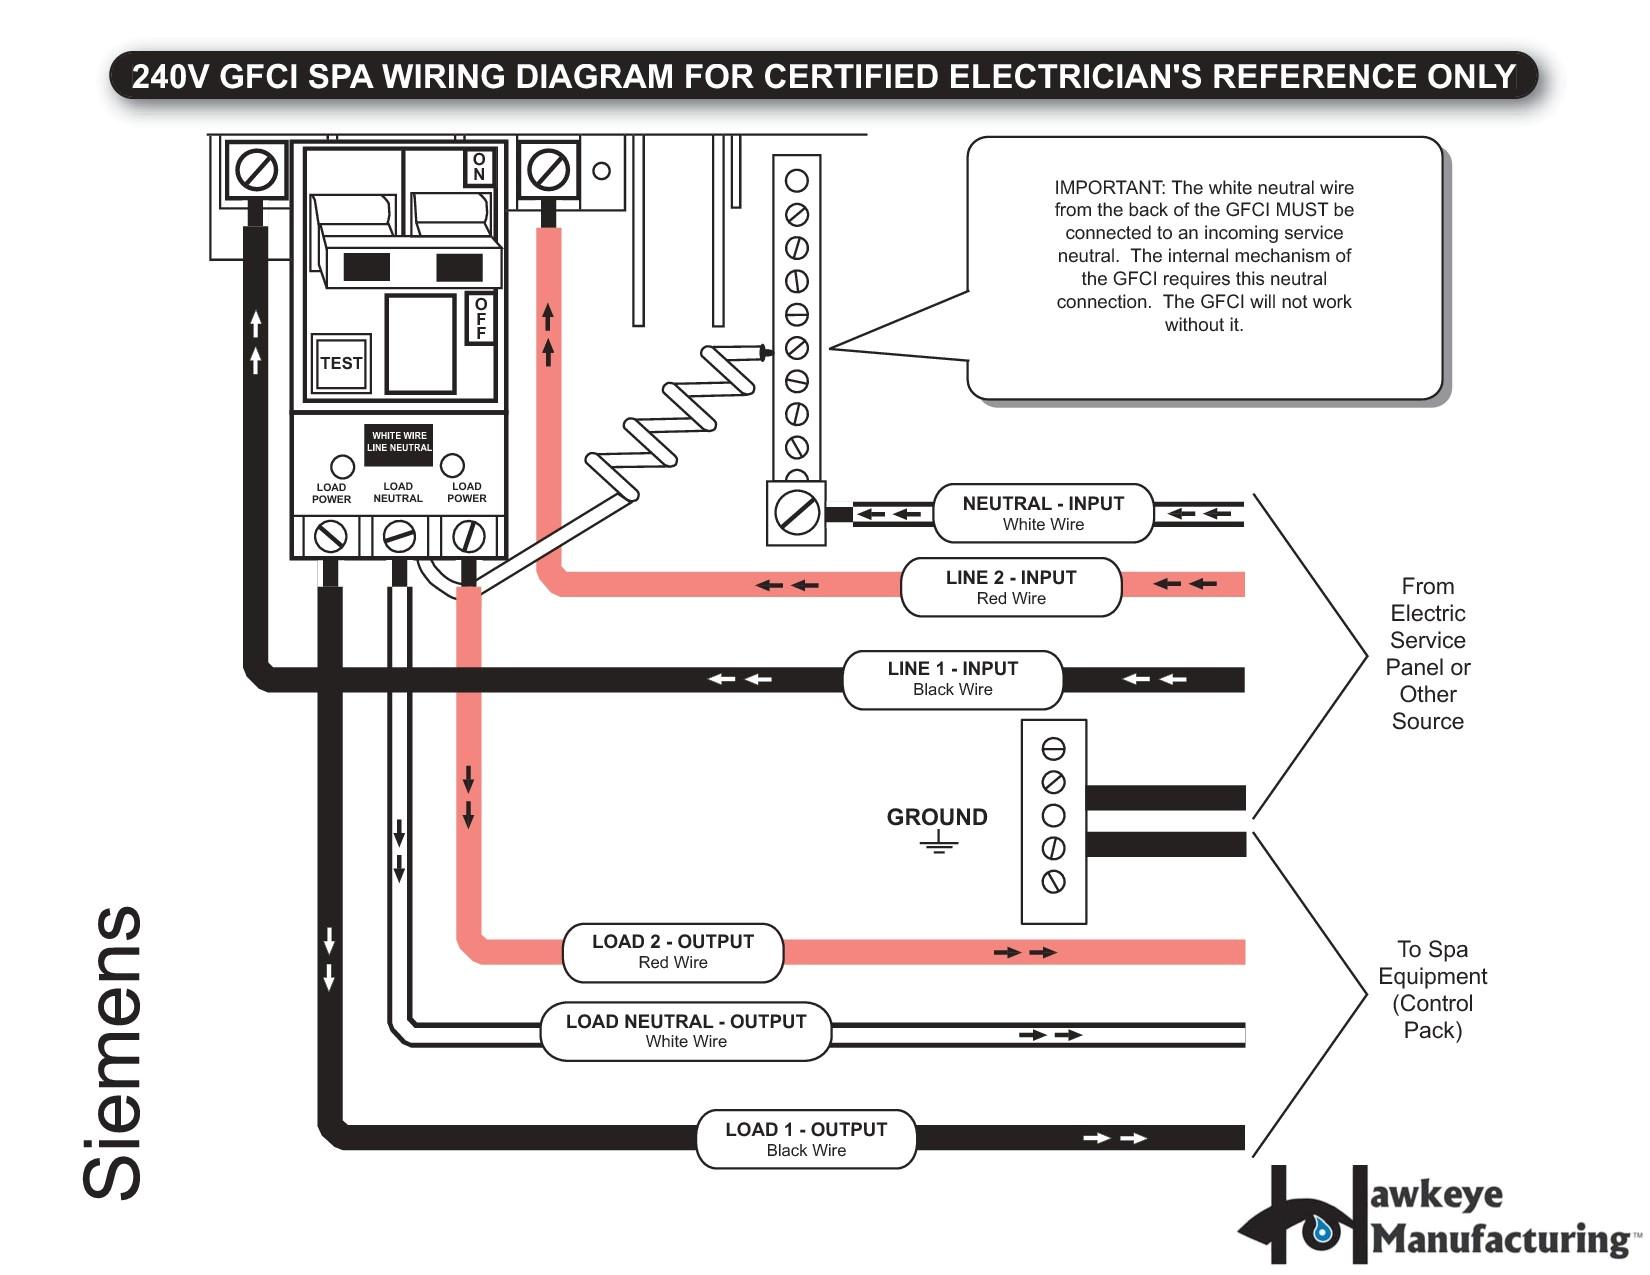 220v hot tub wiring diagram wiring 110v from 220v breaker diagram today review entrancing 5r jpg